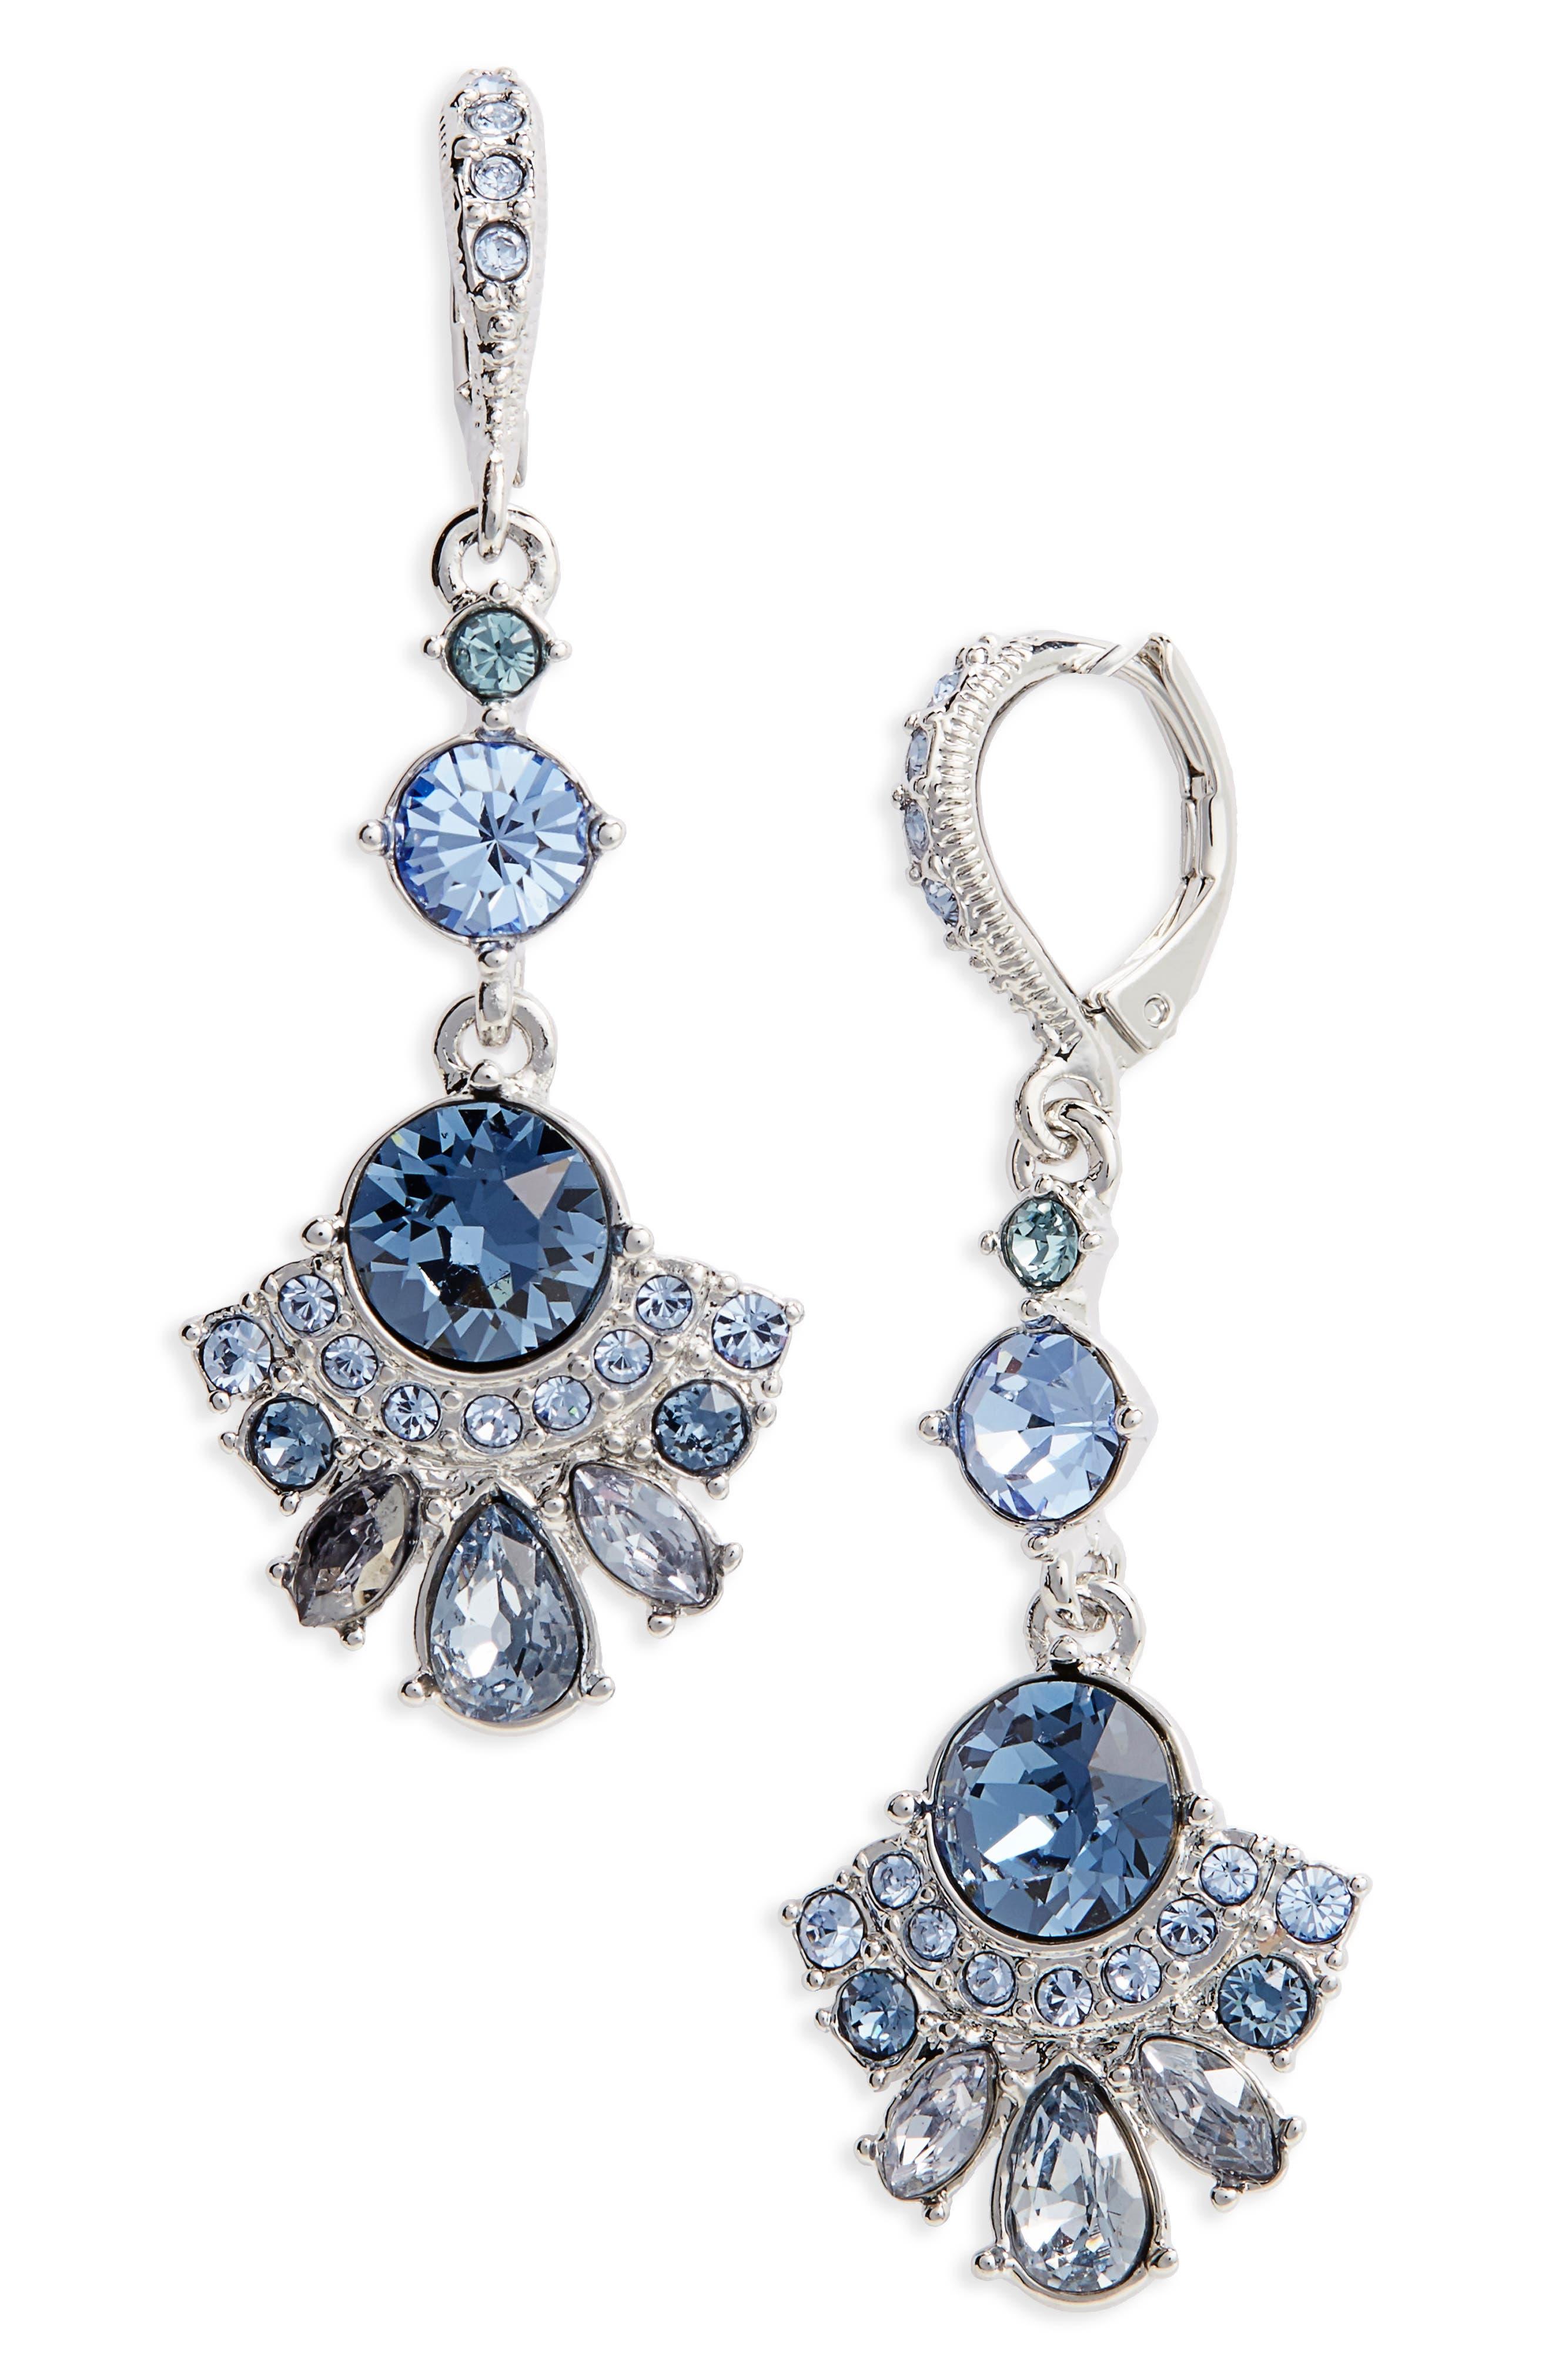 Verona Drop Earrings,                             Main thumbnail 1, color,                             040